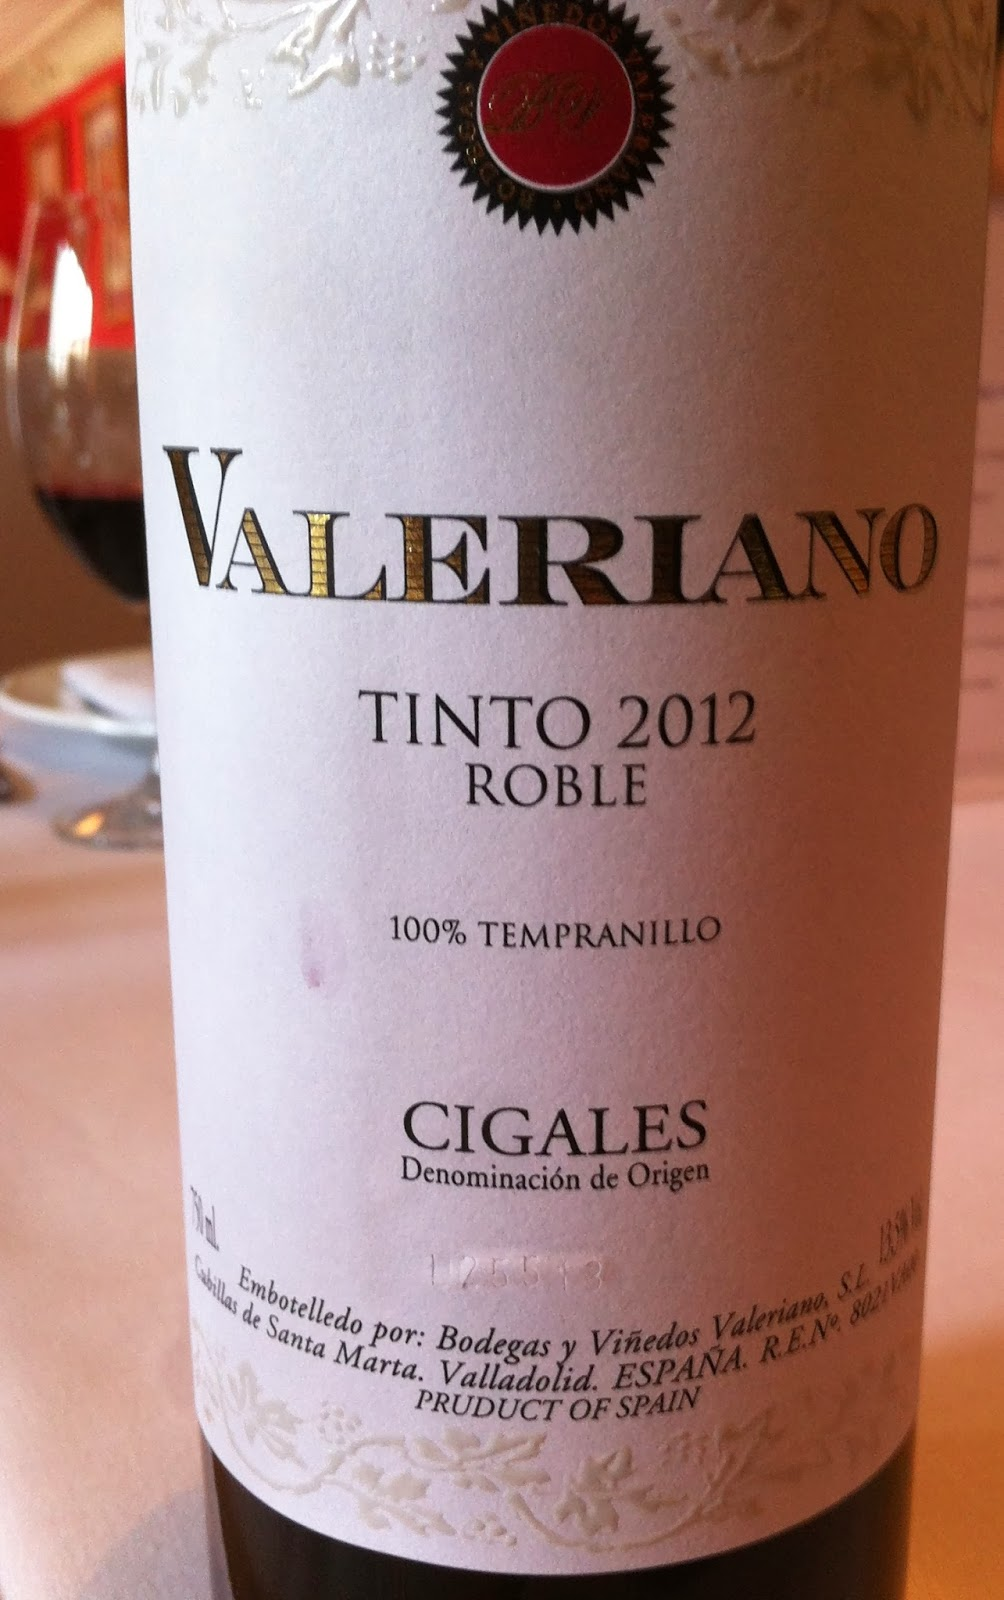 valeriano-roble-2012-cigales-tinto